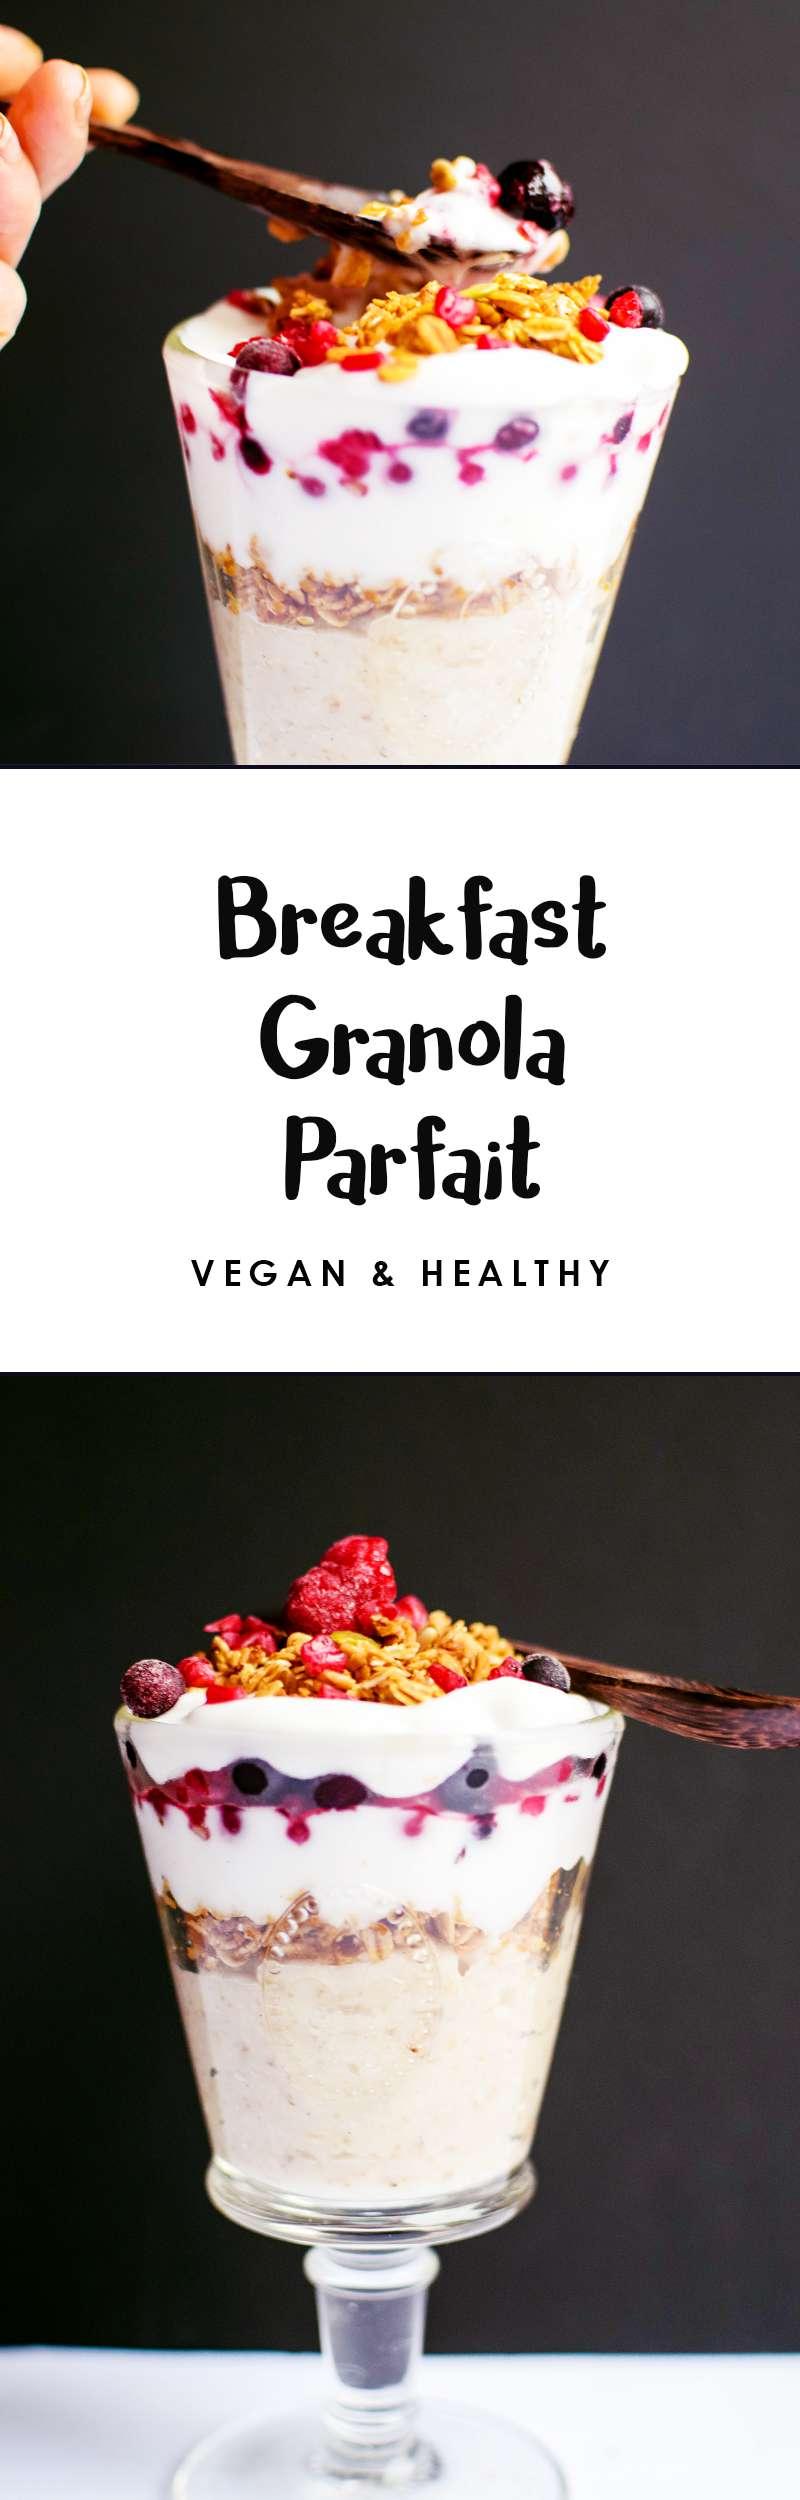 Easy granola parfait recipes